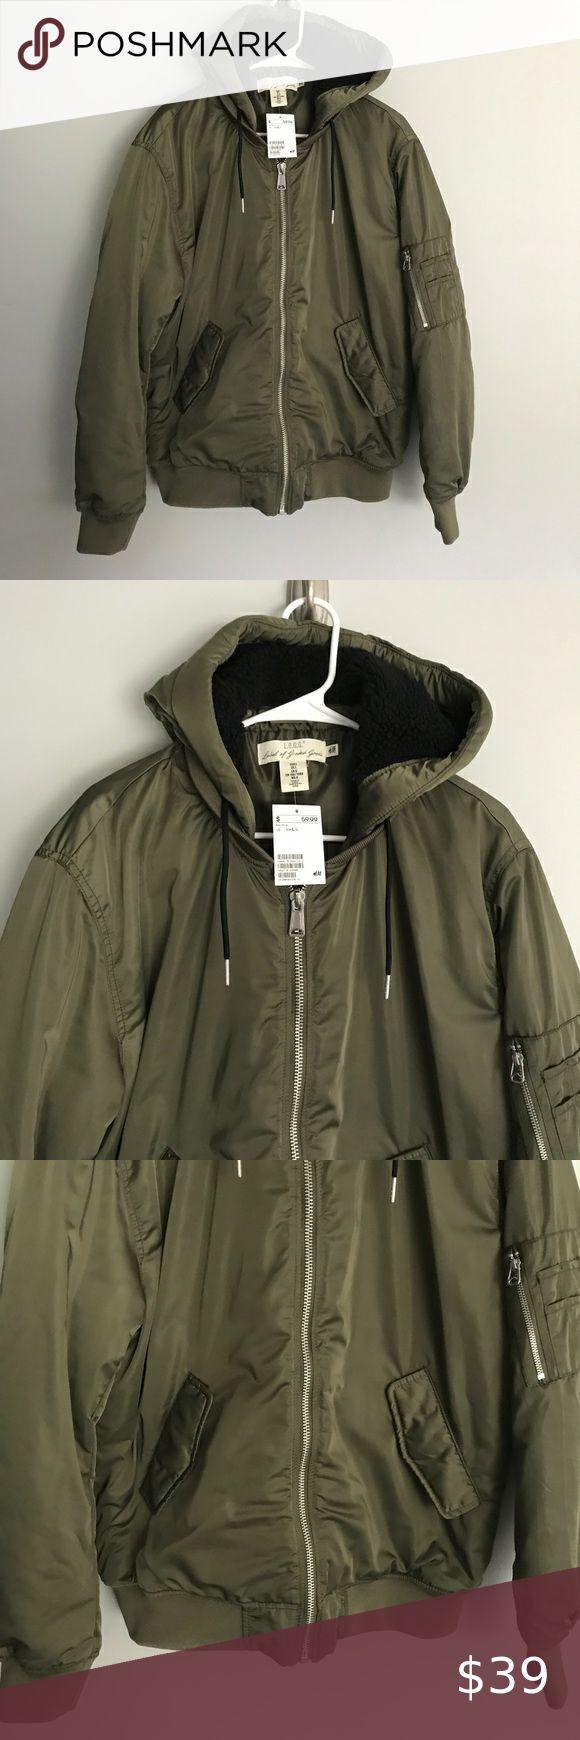 NWT HM men hooded bomber puffer coat olive green L New